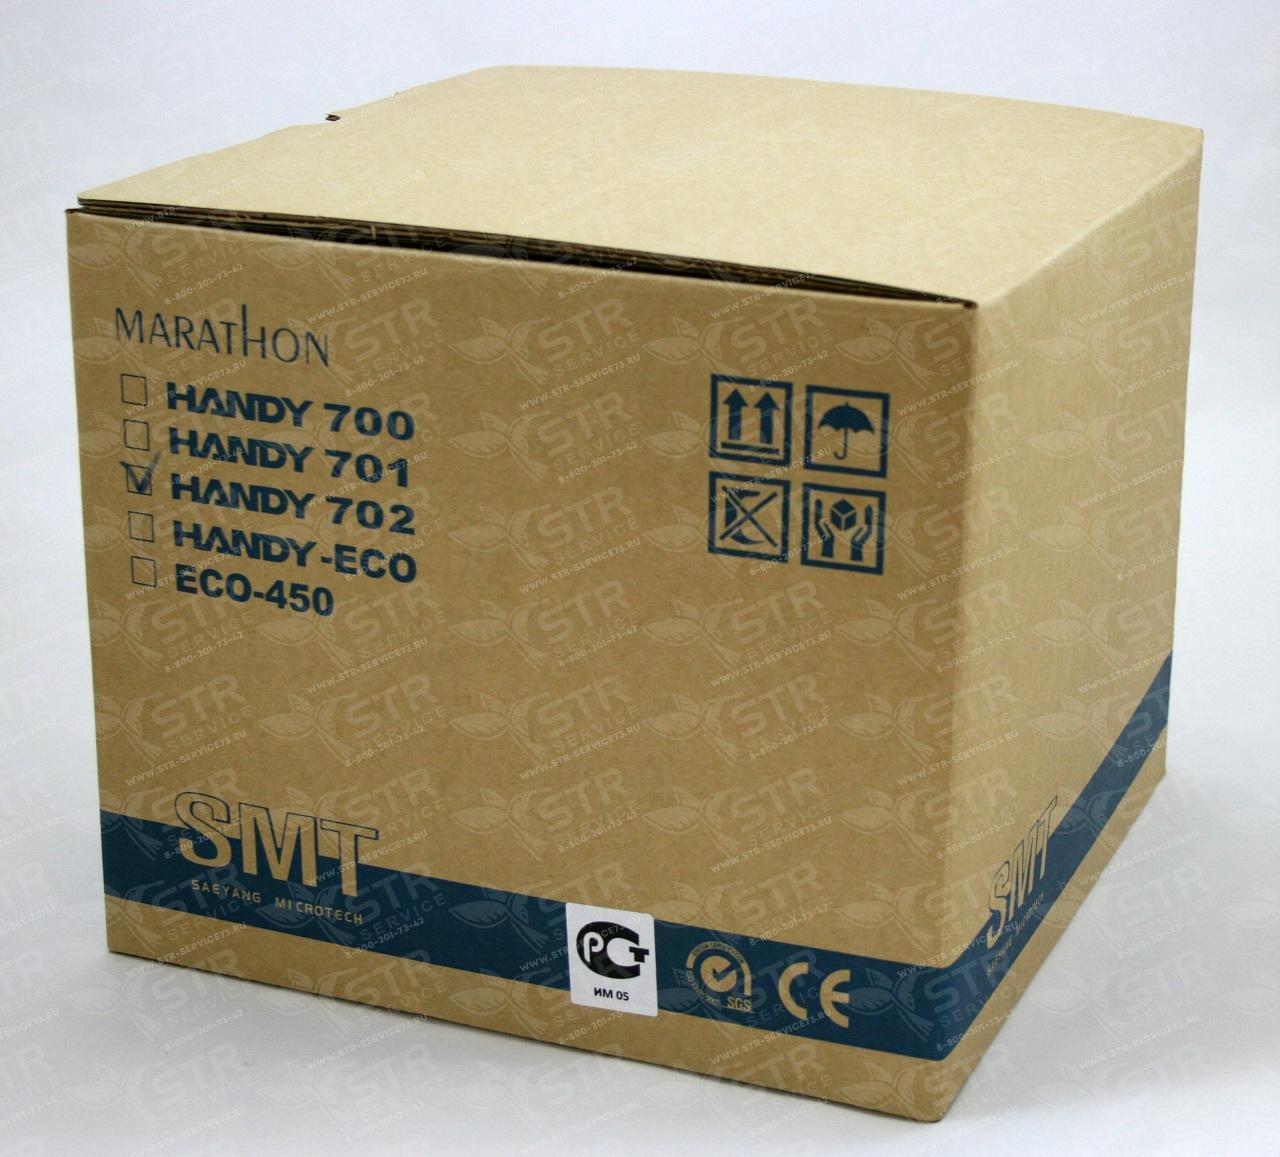 Аппарат Marathon Handy 702 Lite / SH40C, без педали